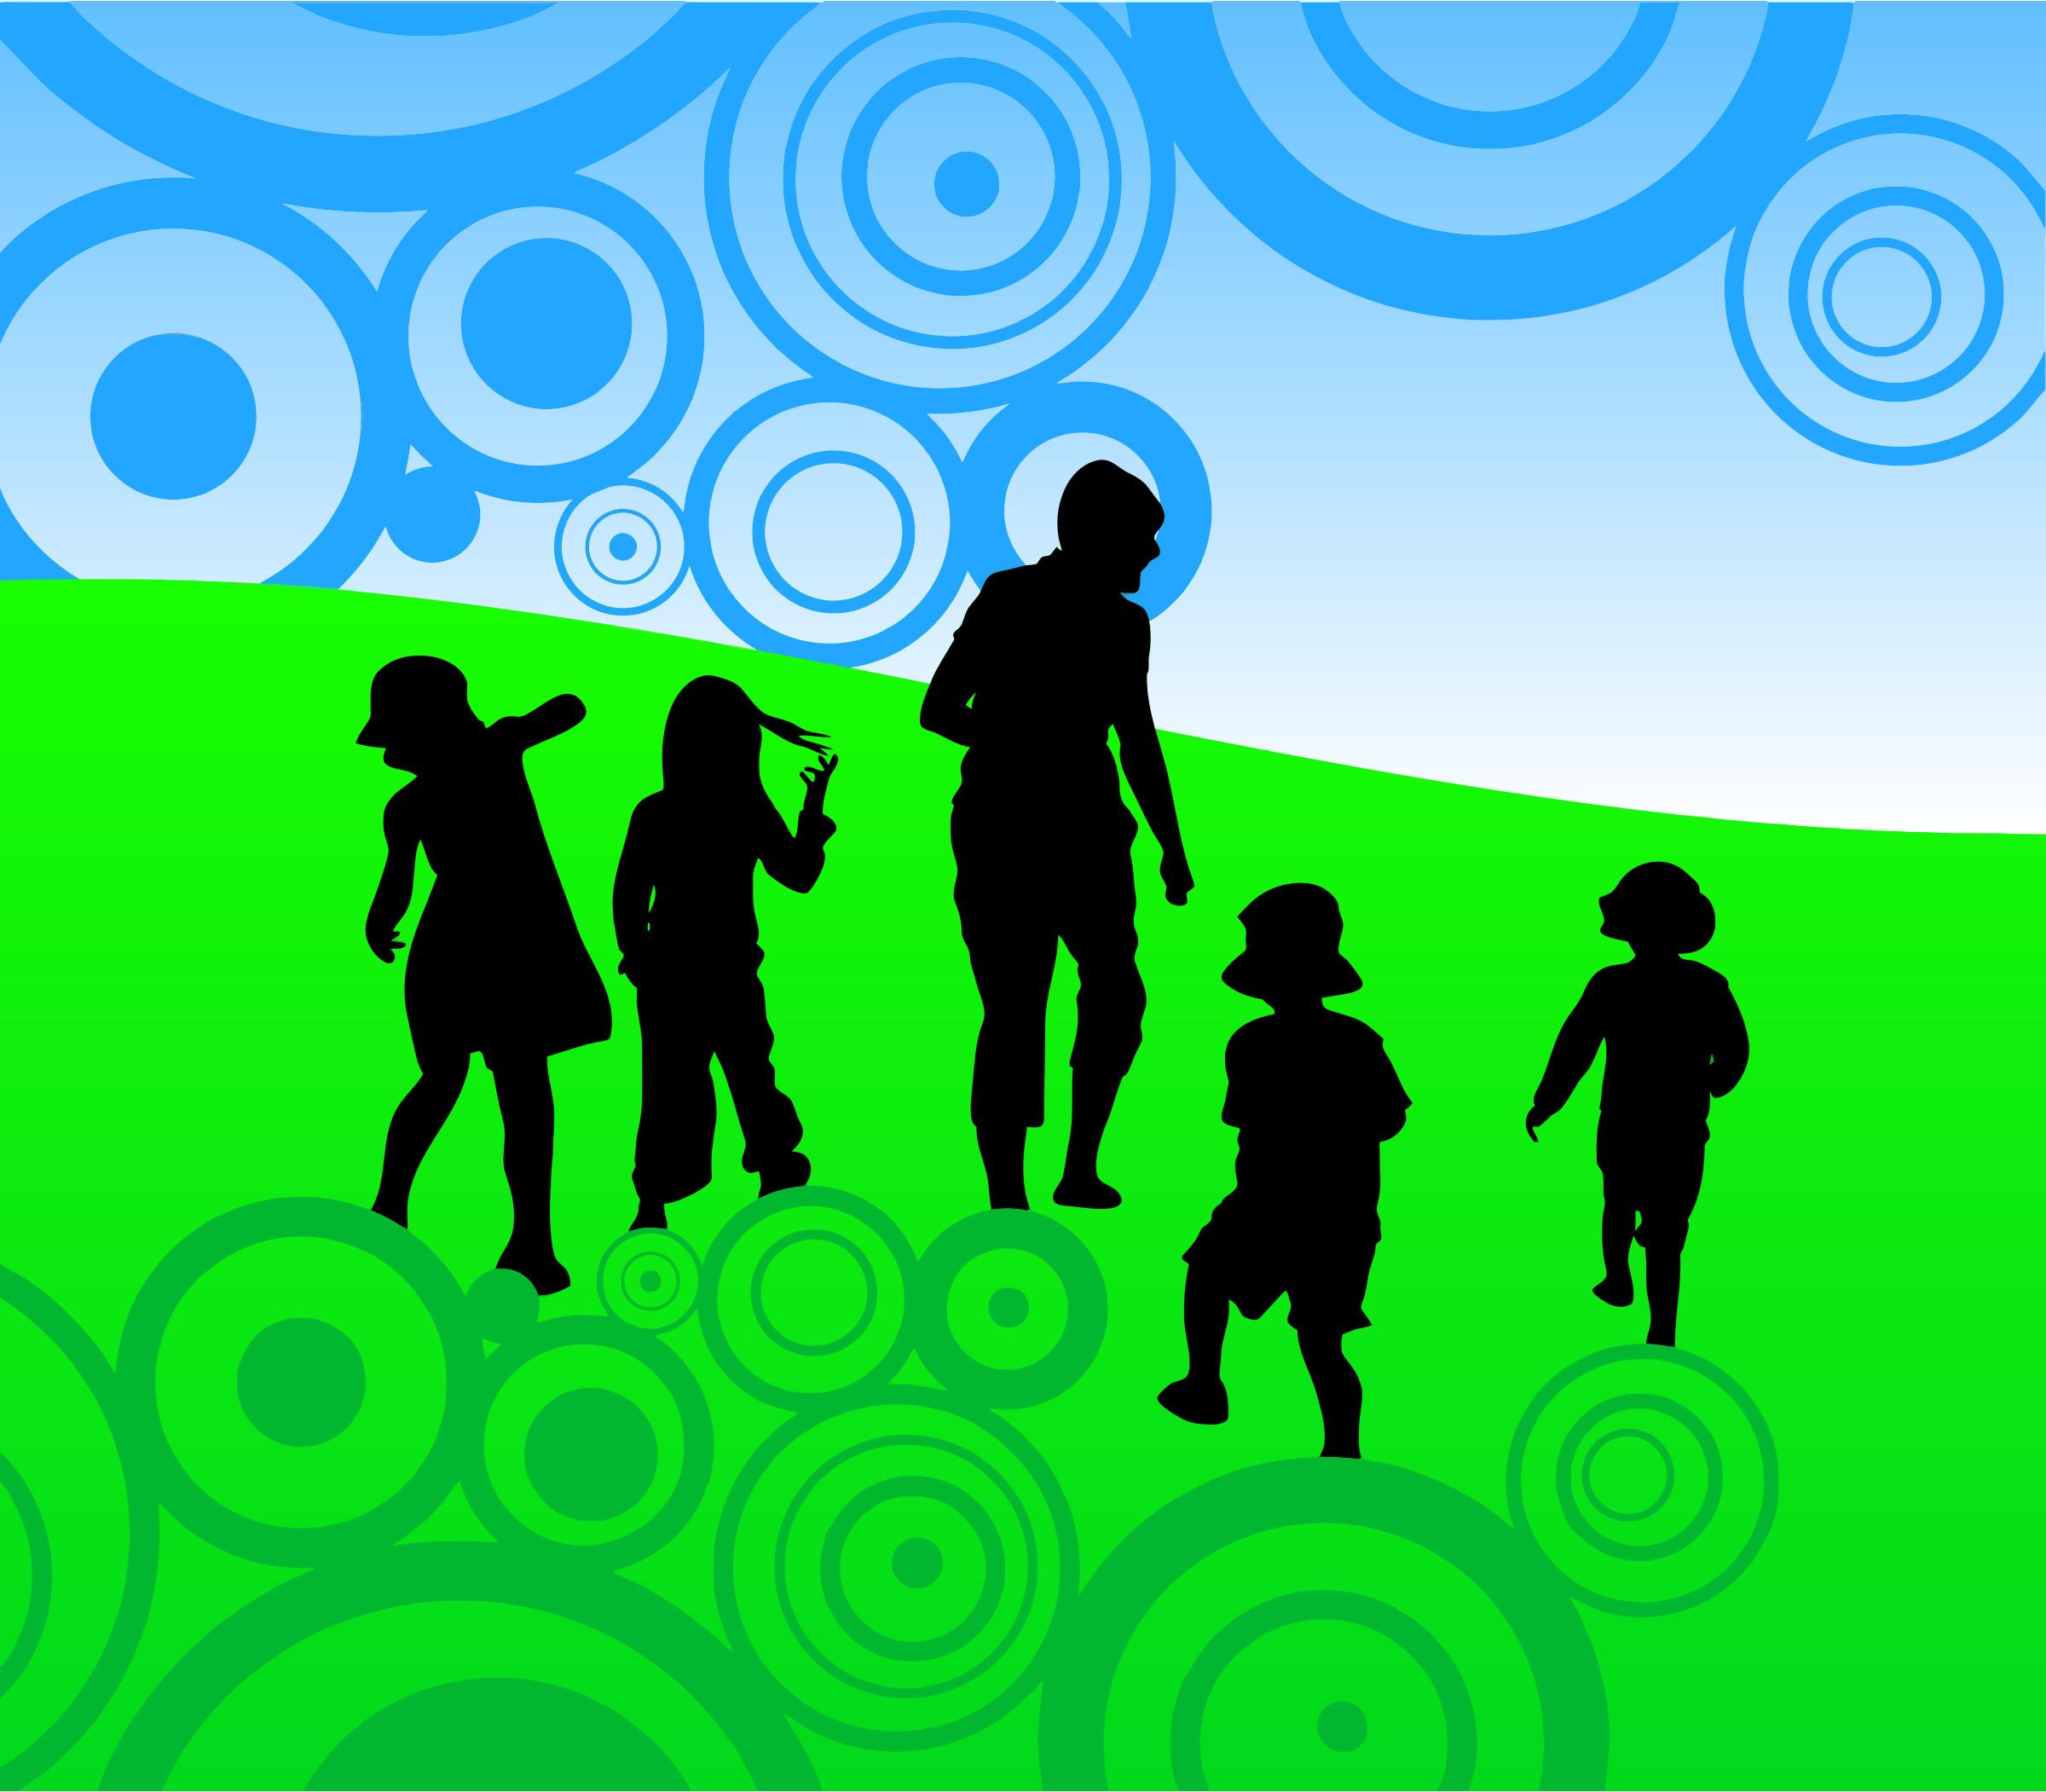 Abstract Children Background